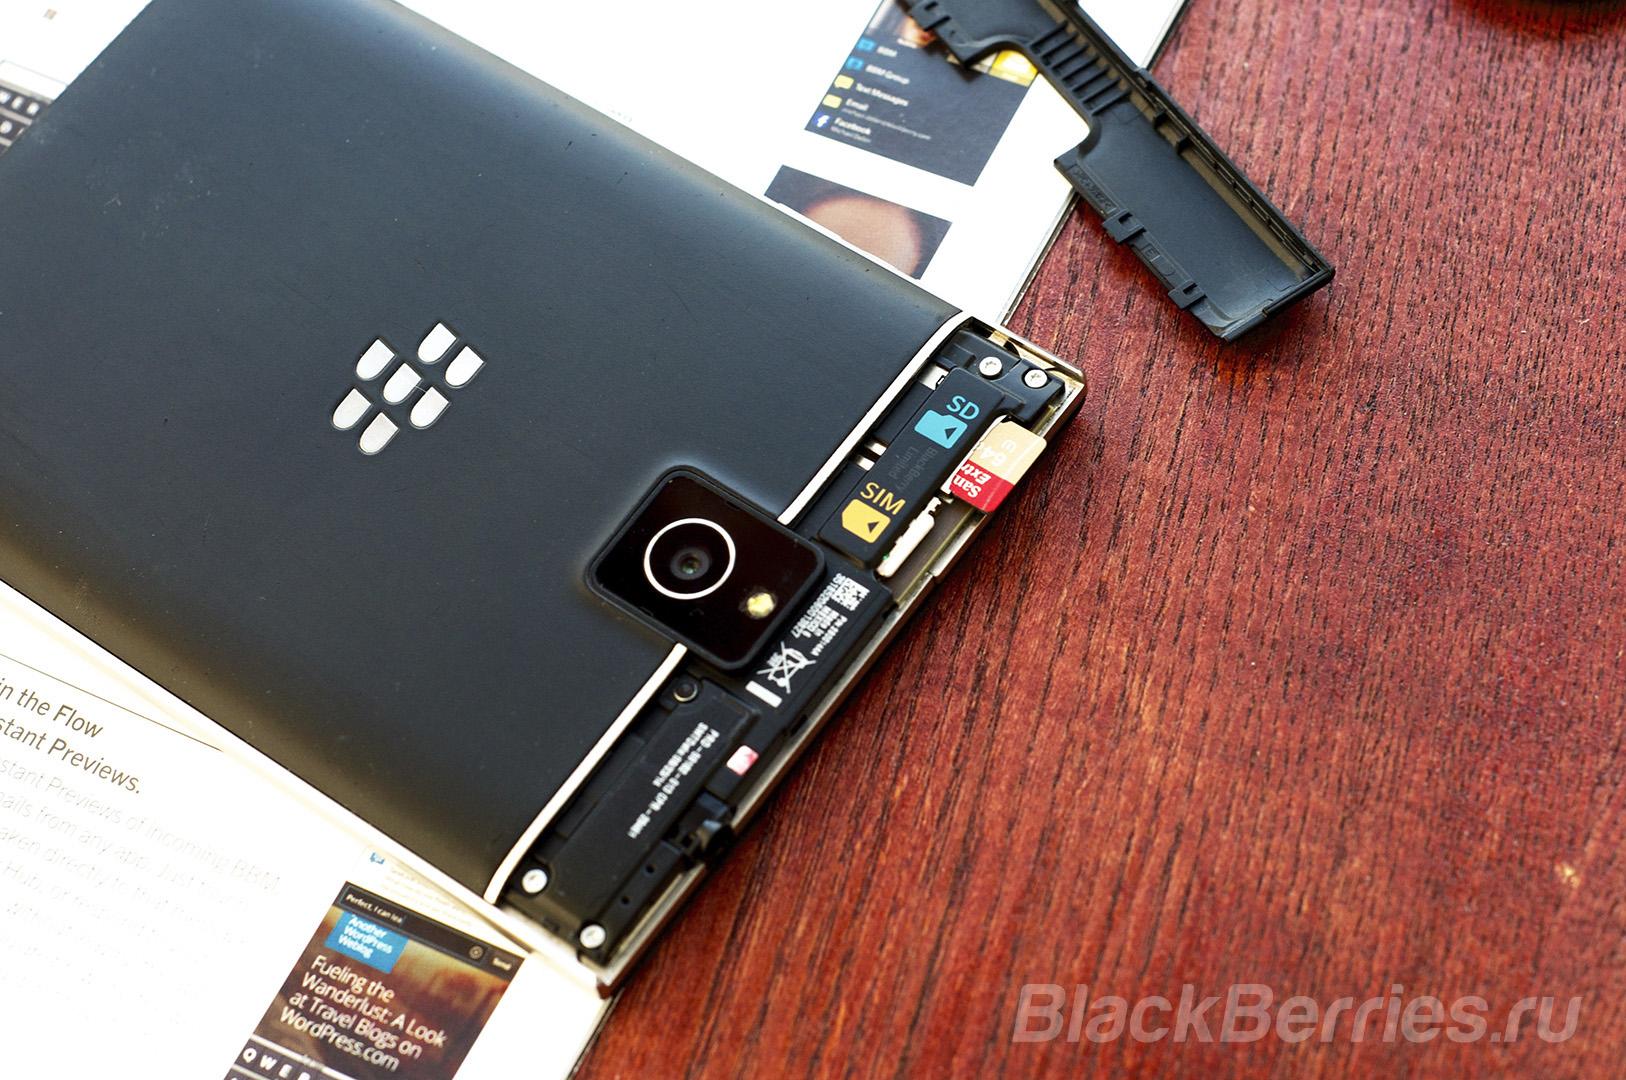 BlackBerry-Passport-Review-2016-52